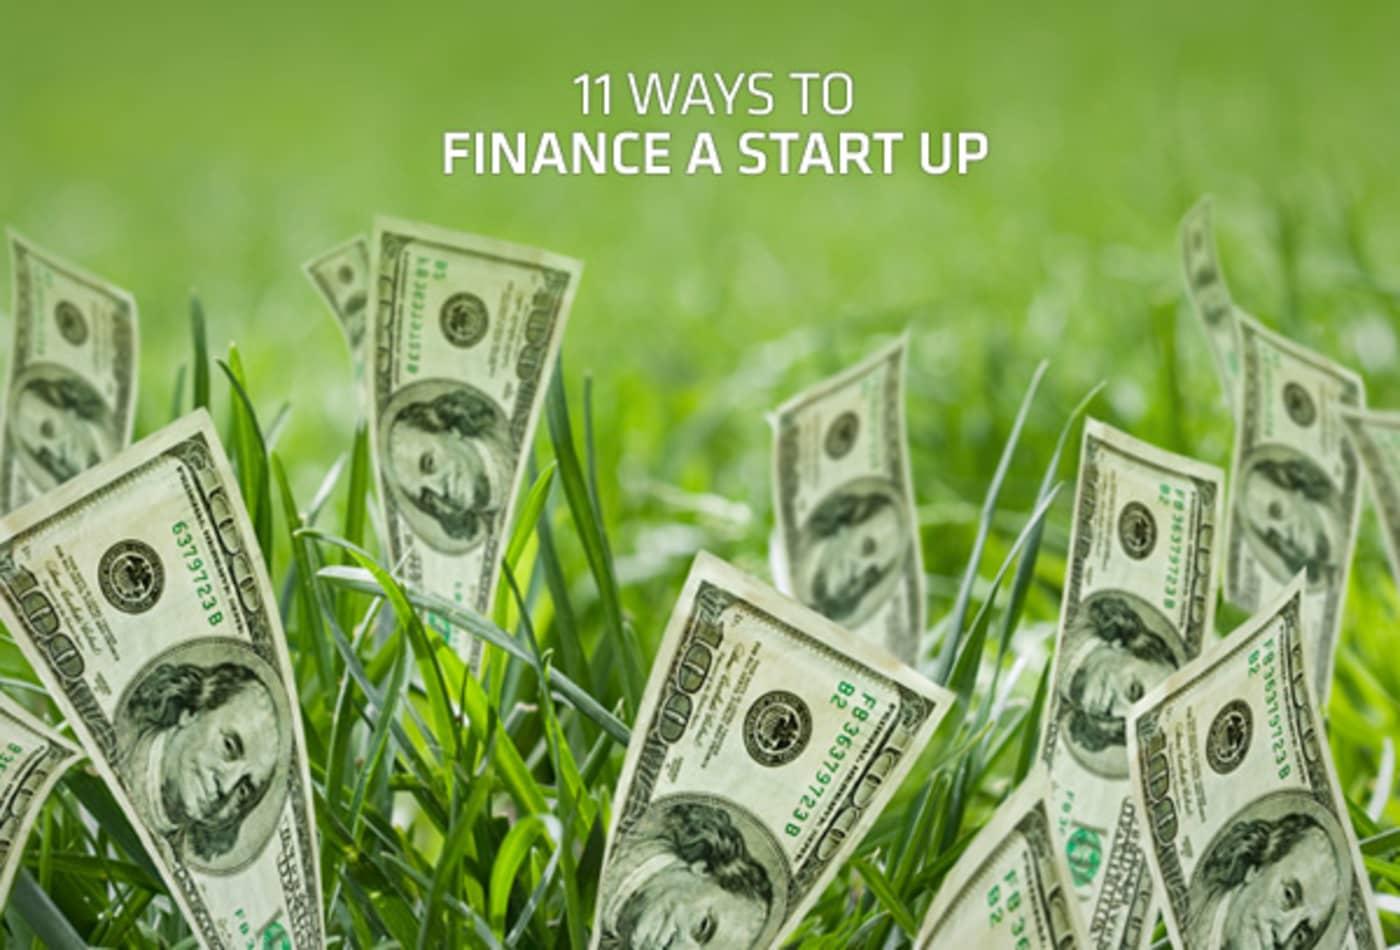 11-ways-to-finance-start-up-cover2.jpg